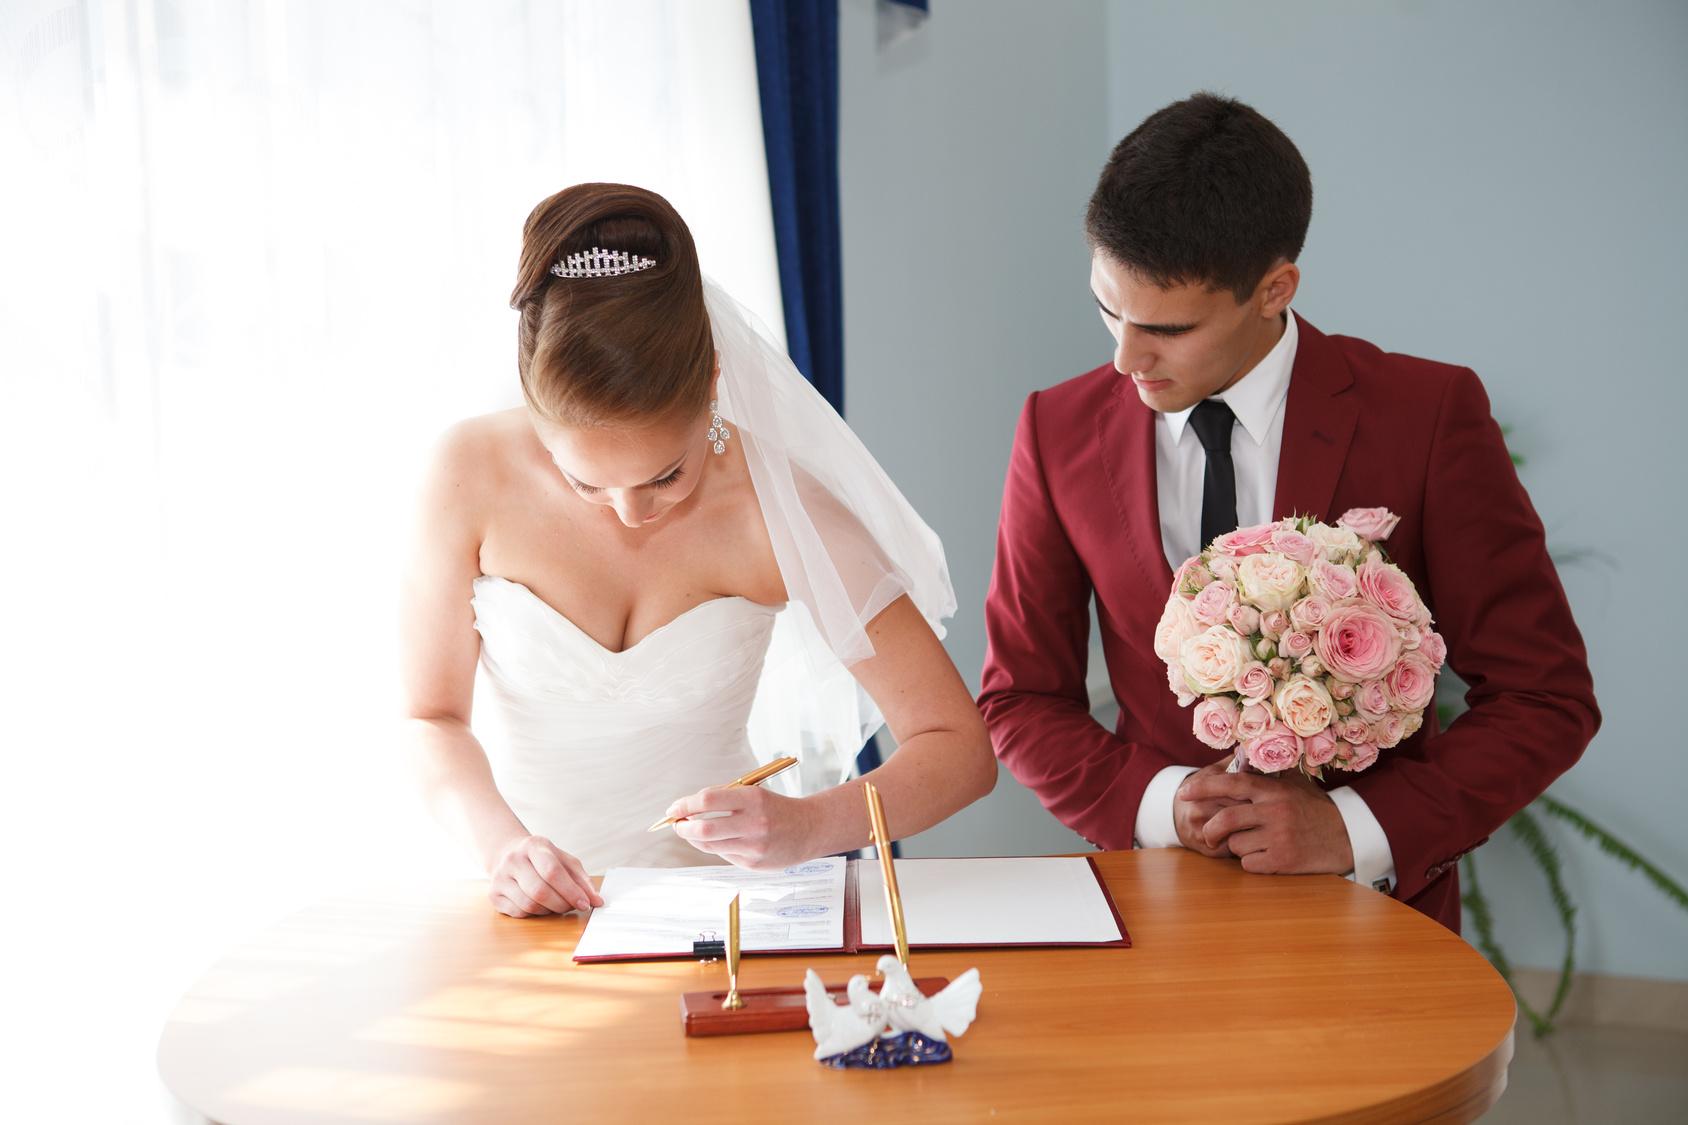 regime mariage universel